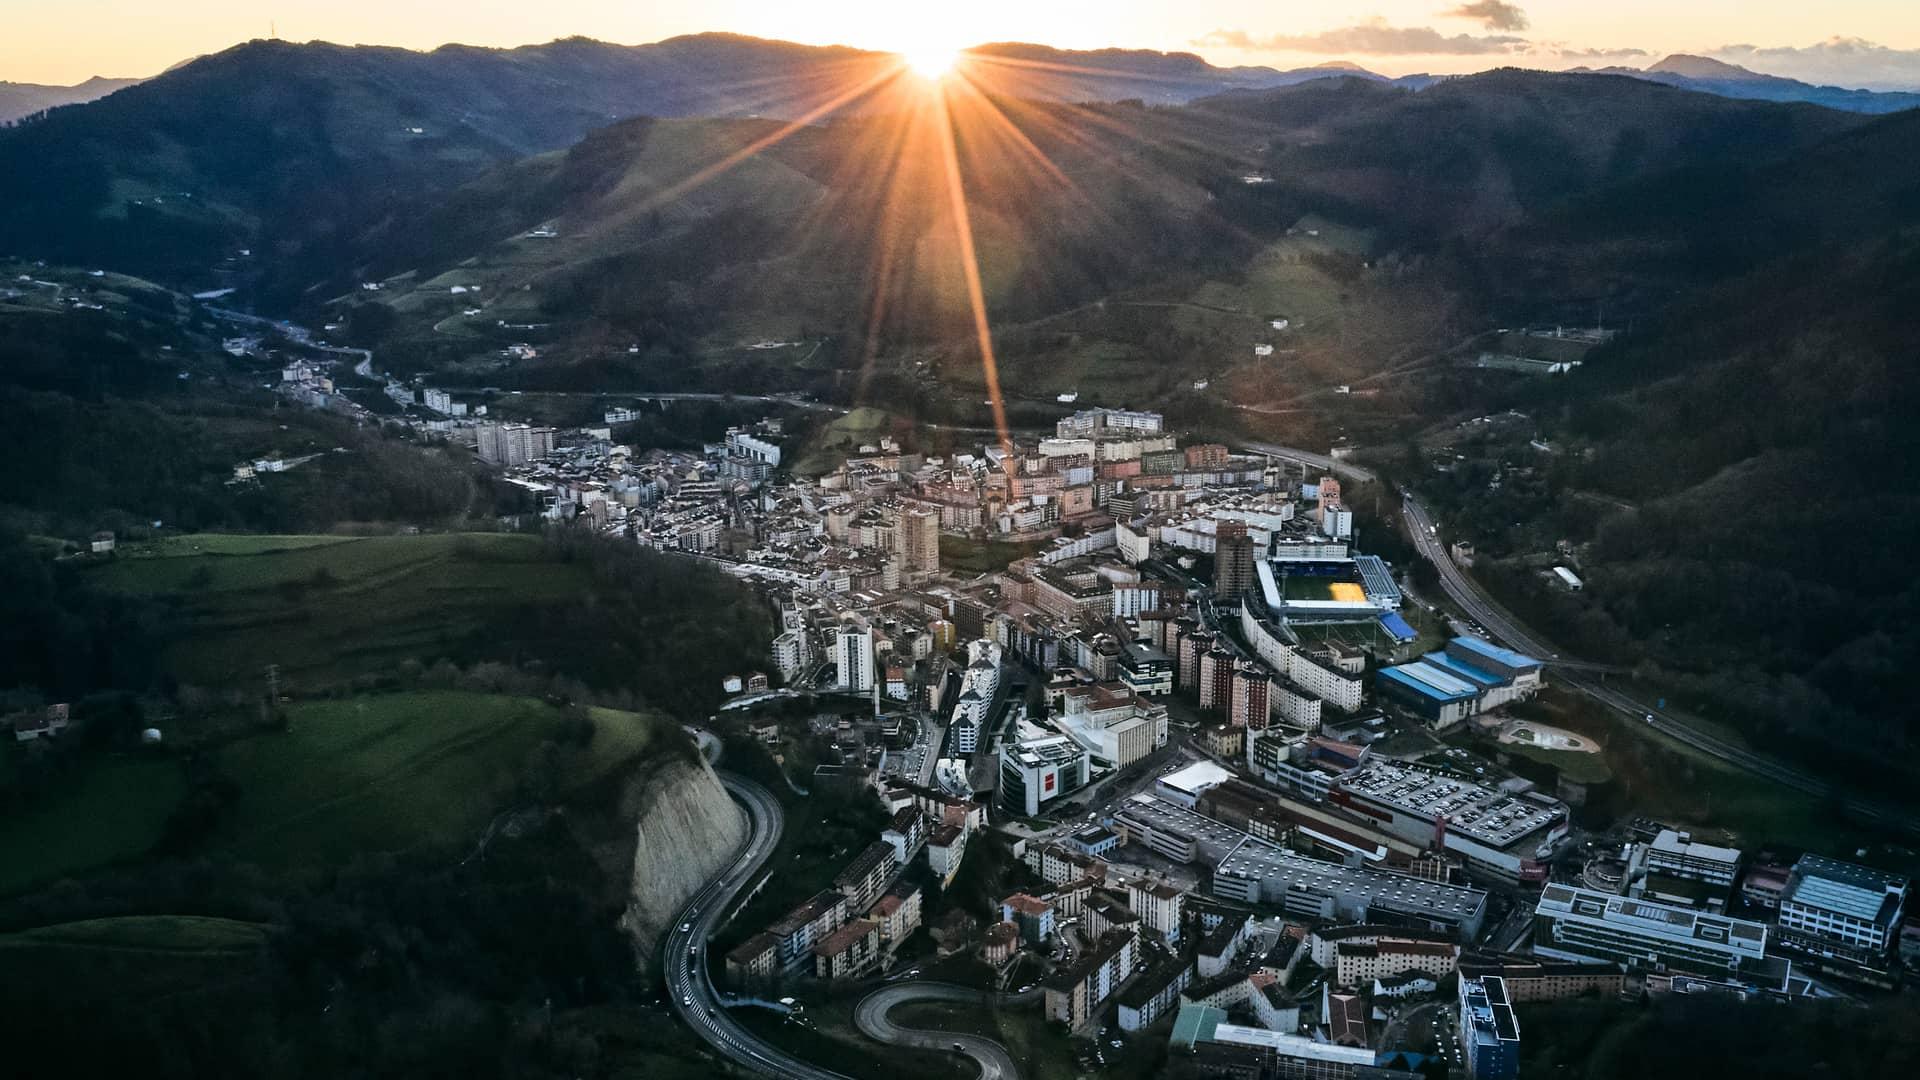 ¿Llega Euskaltel a Eibar? Compruébalo sin problema